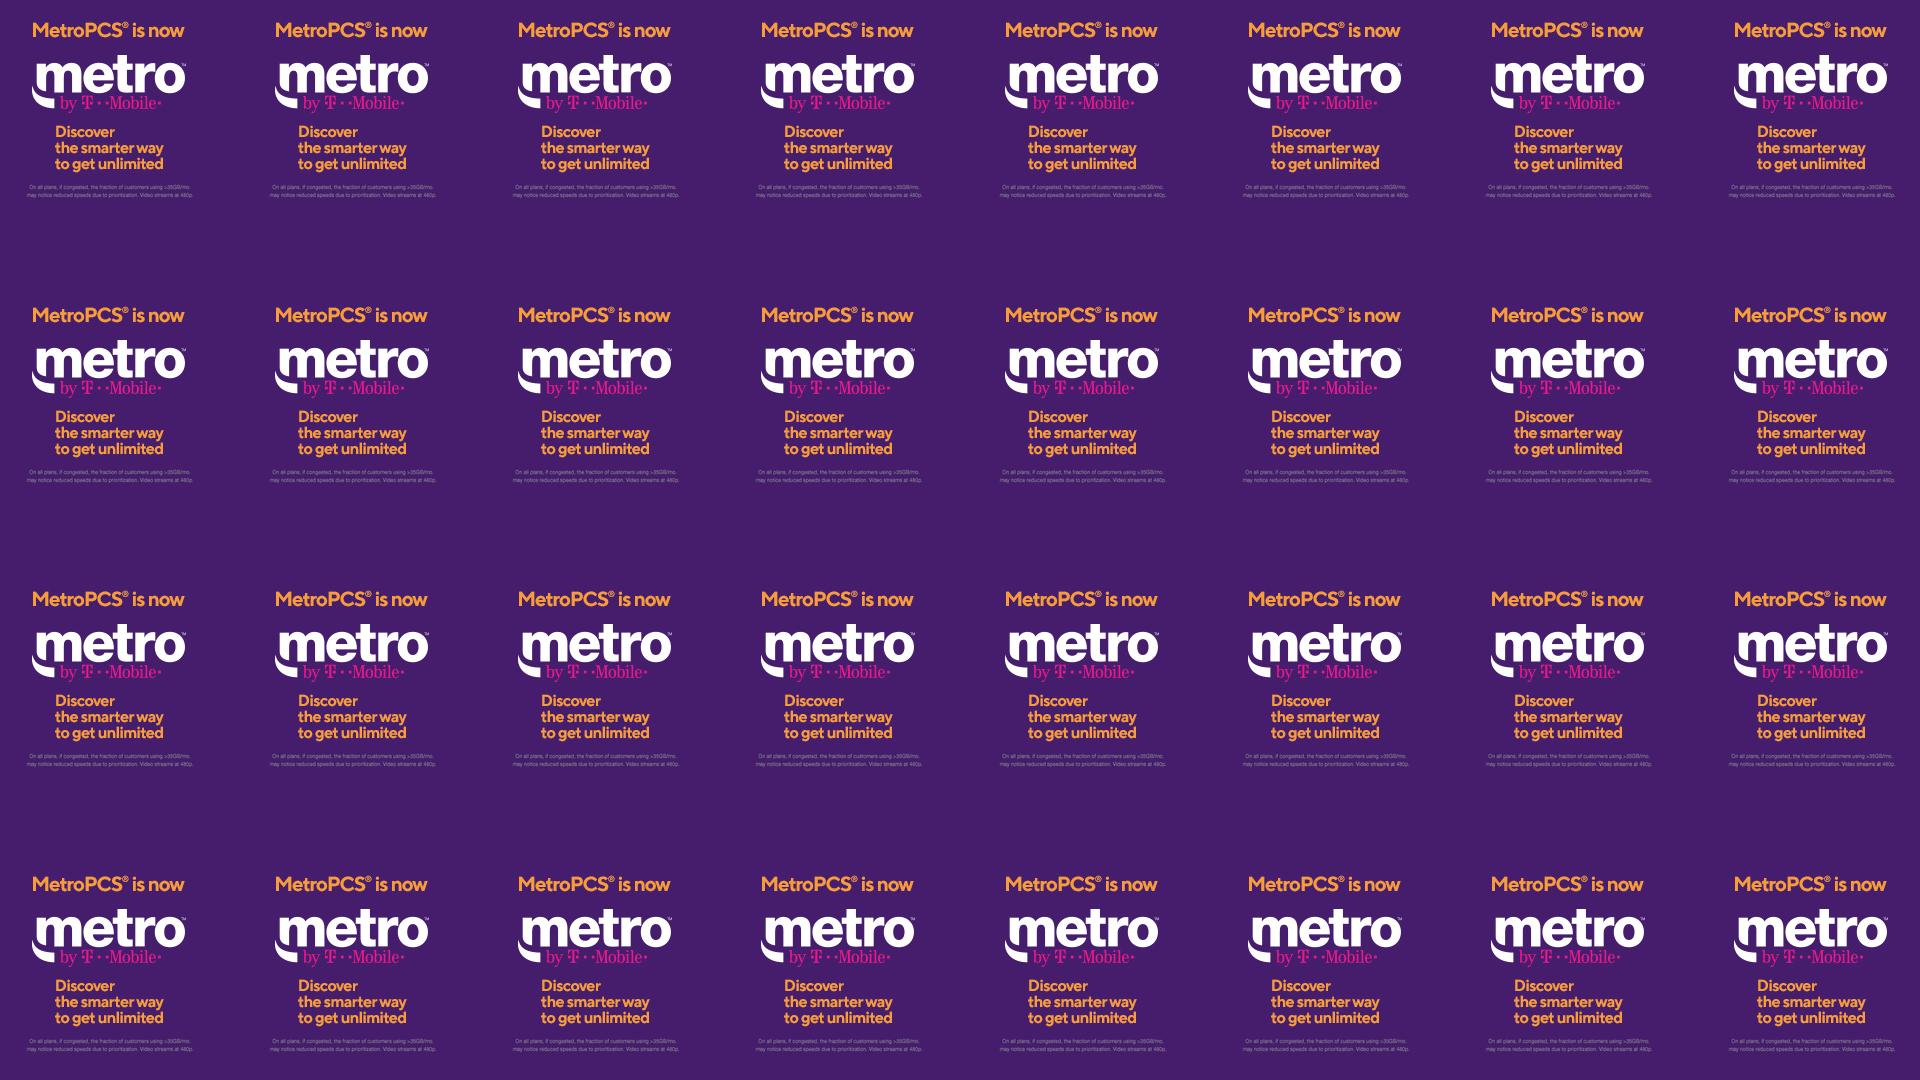 Metro Tmobile Wallpaper